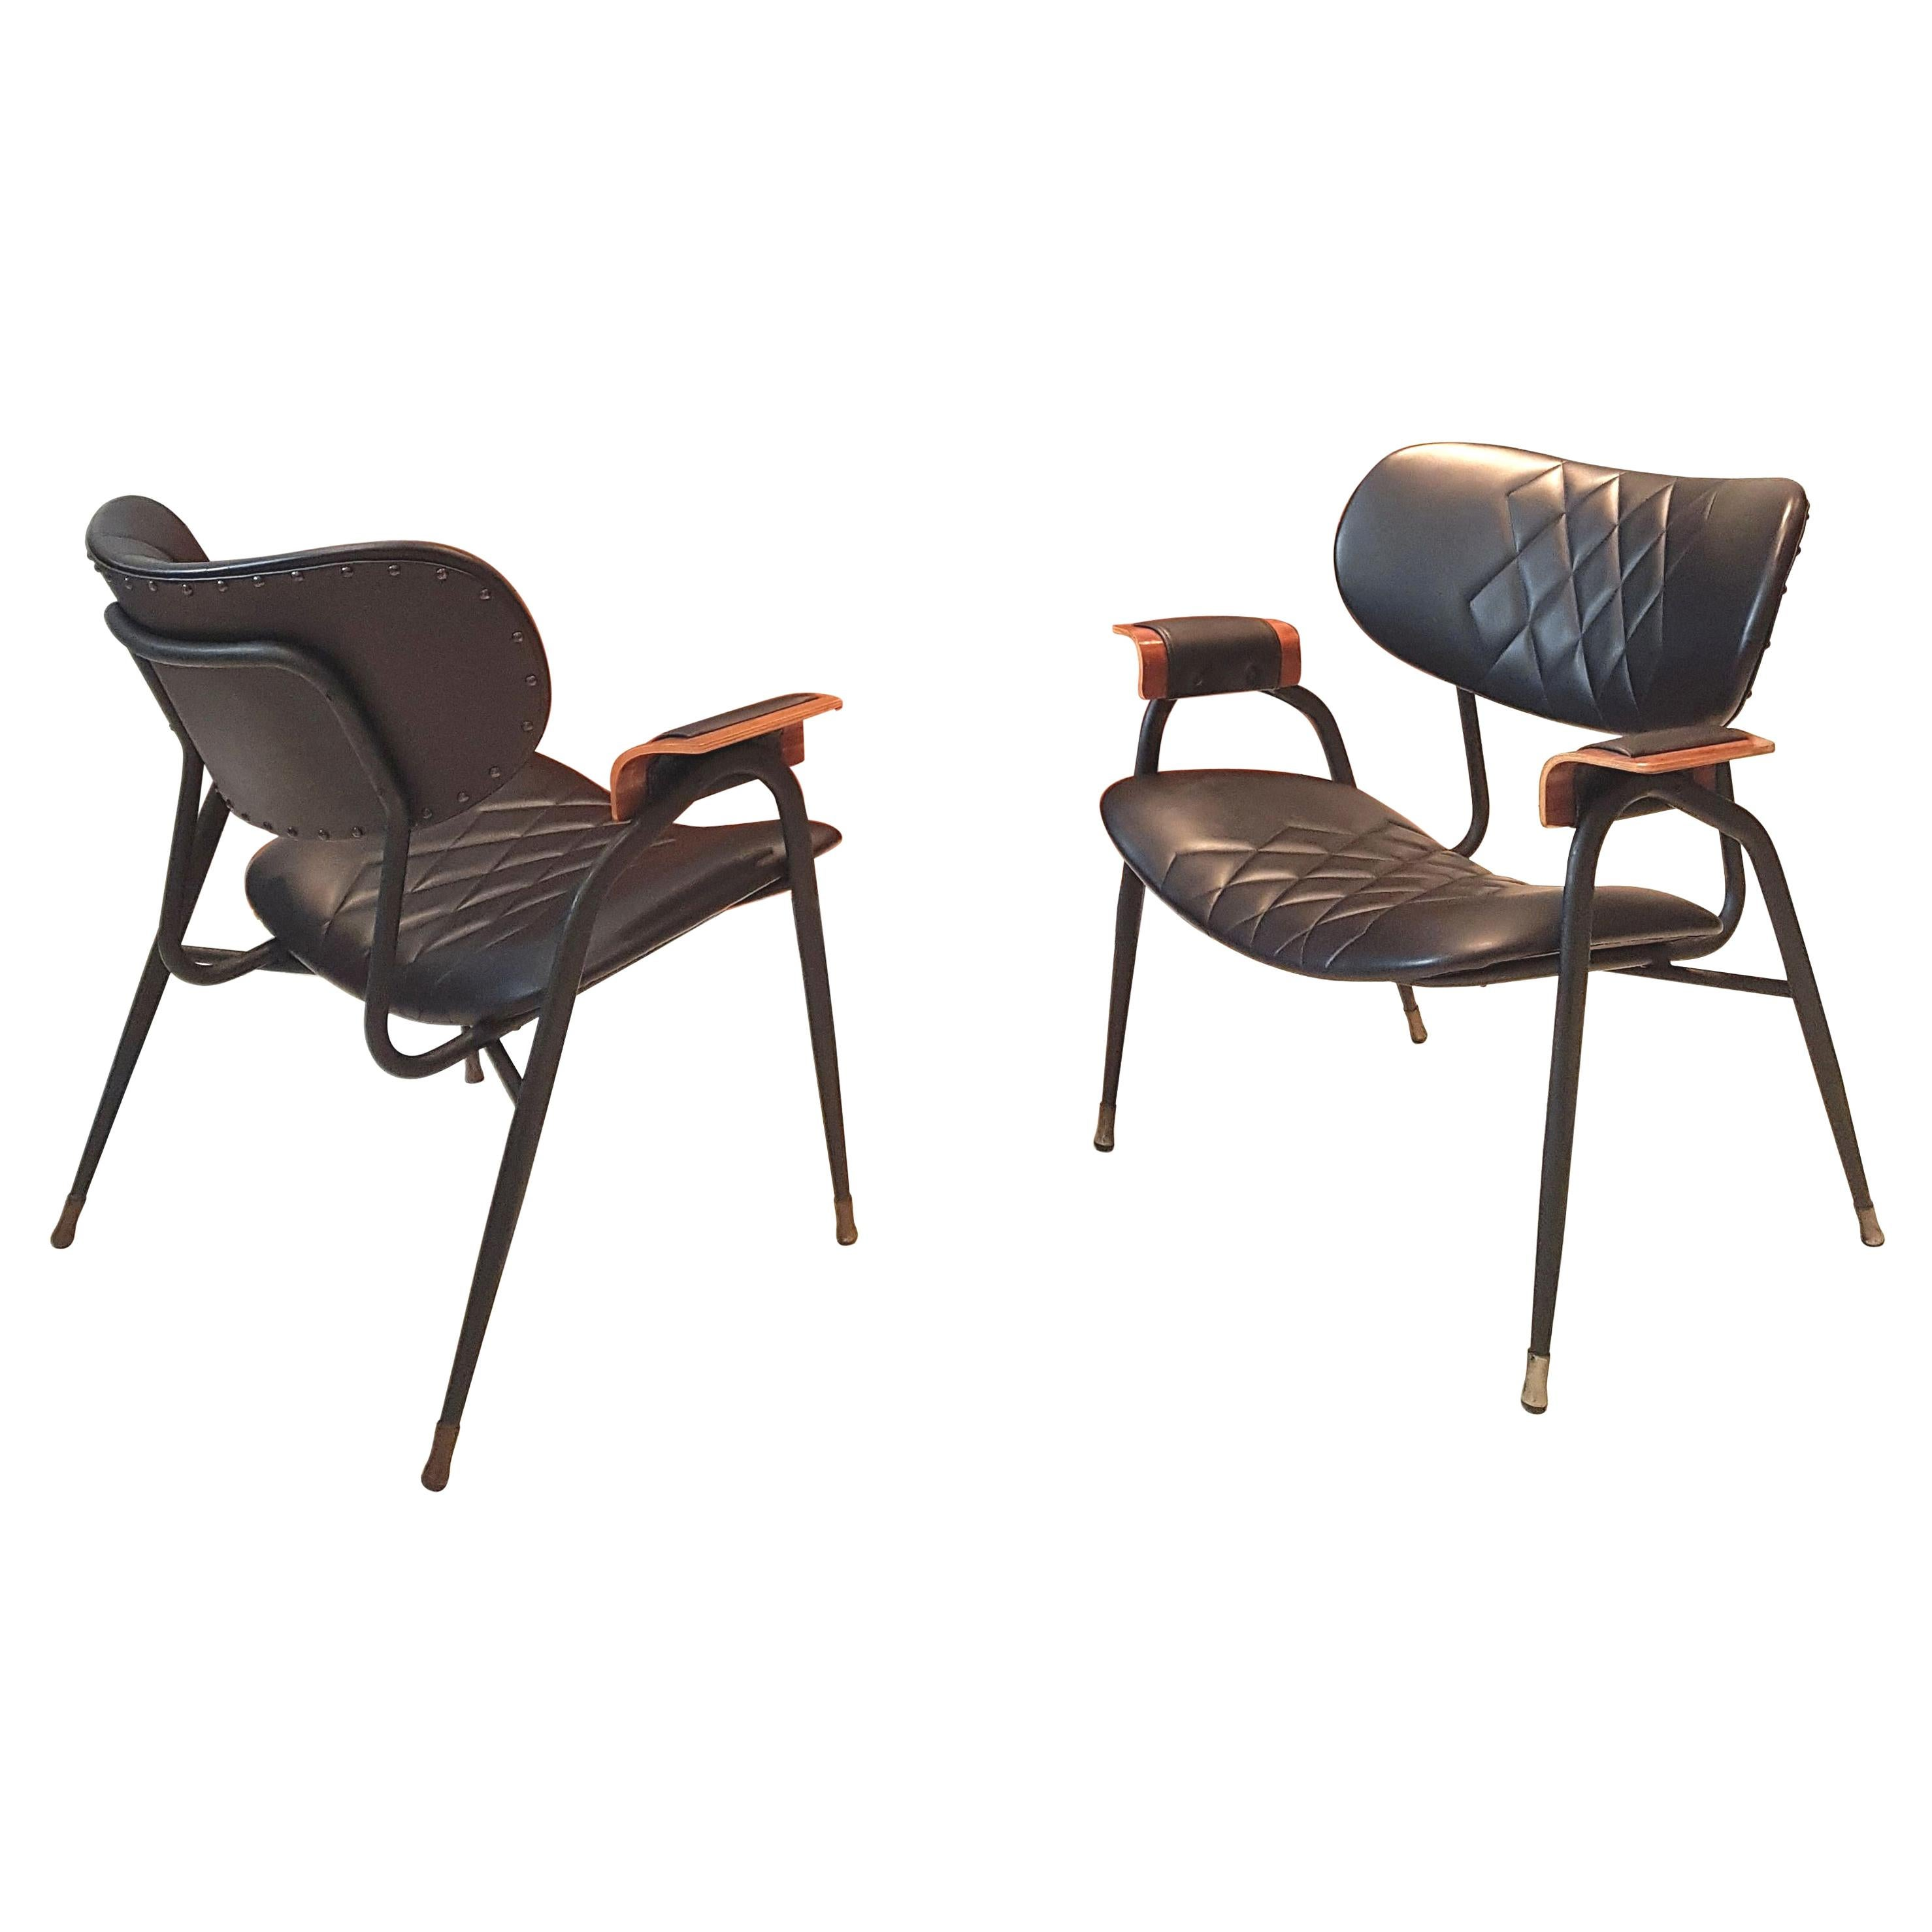 Mid-Century Modern, Italian Metal Framed Chairs by RIMA